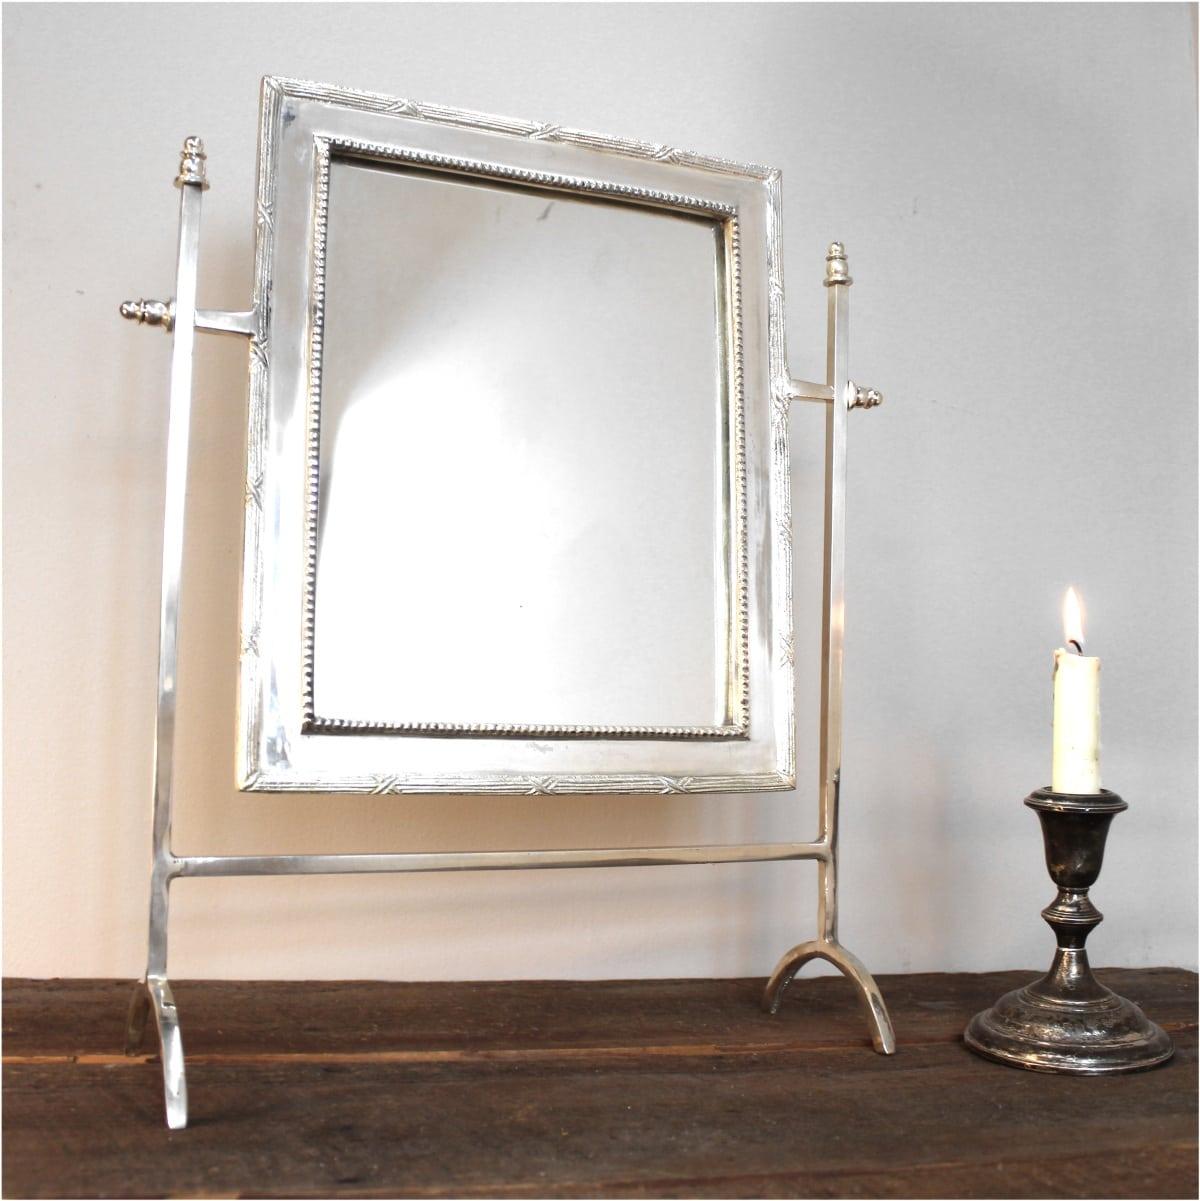 Silver Bedroom Bathroom Mirror Swivel Mount Bamboo Edge SALE! - The ...